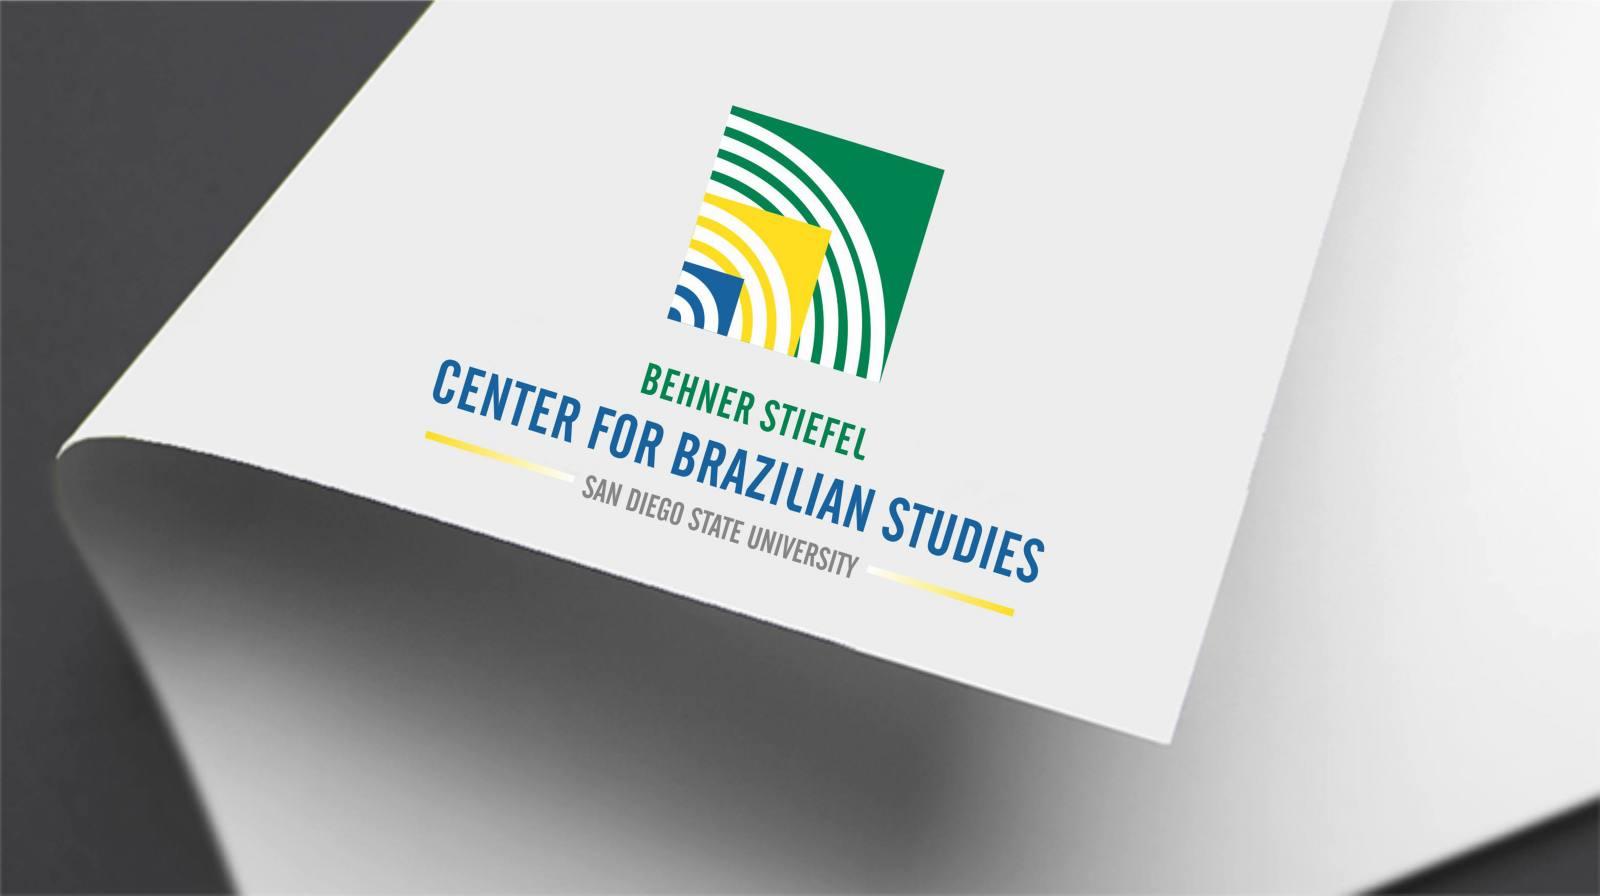 Marca internacional do Center for Brazilian Studies